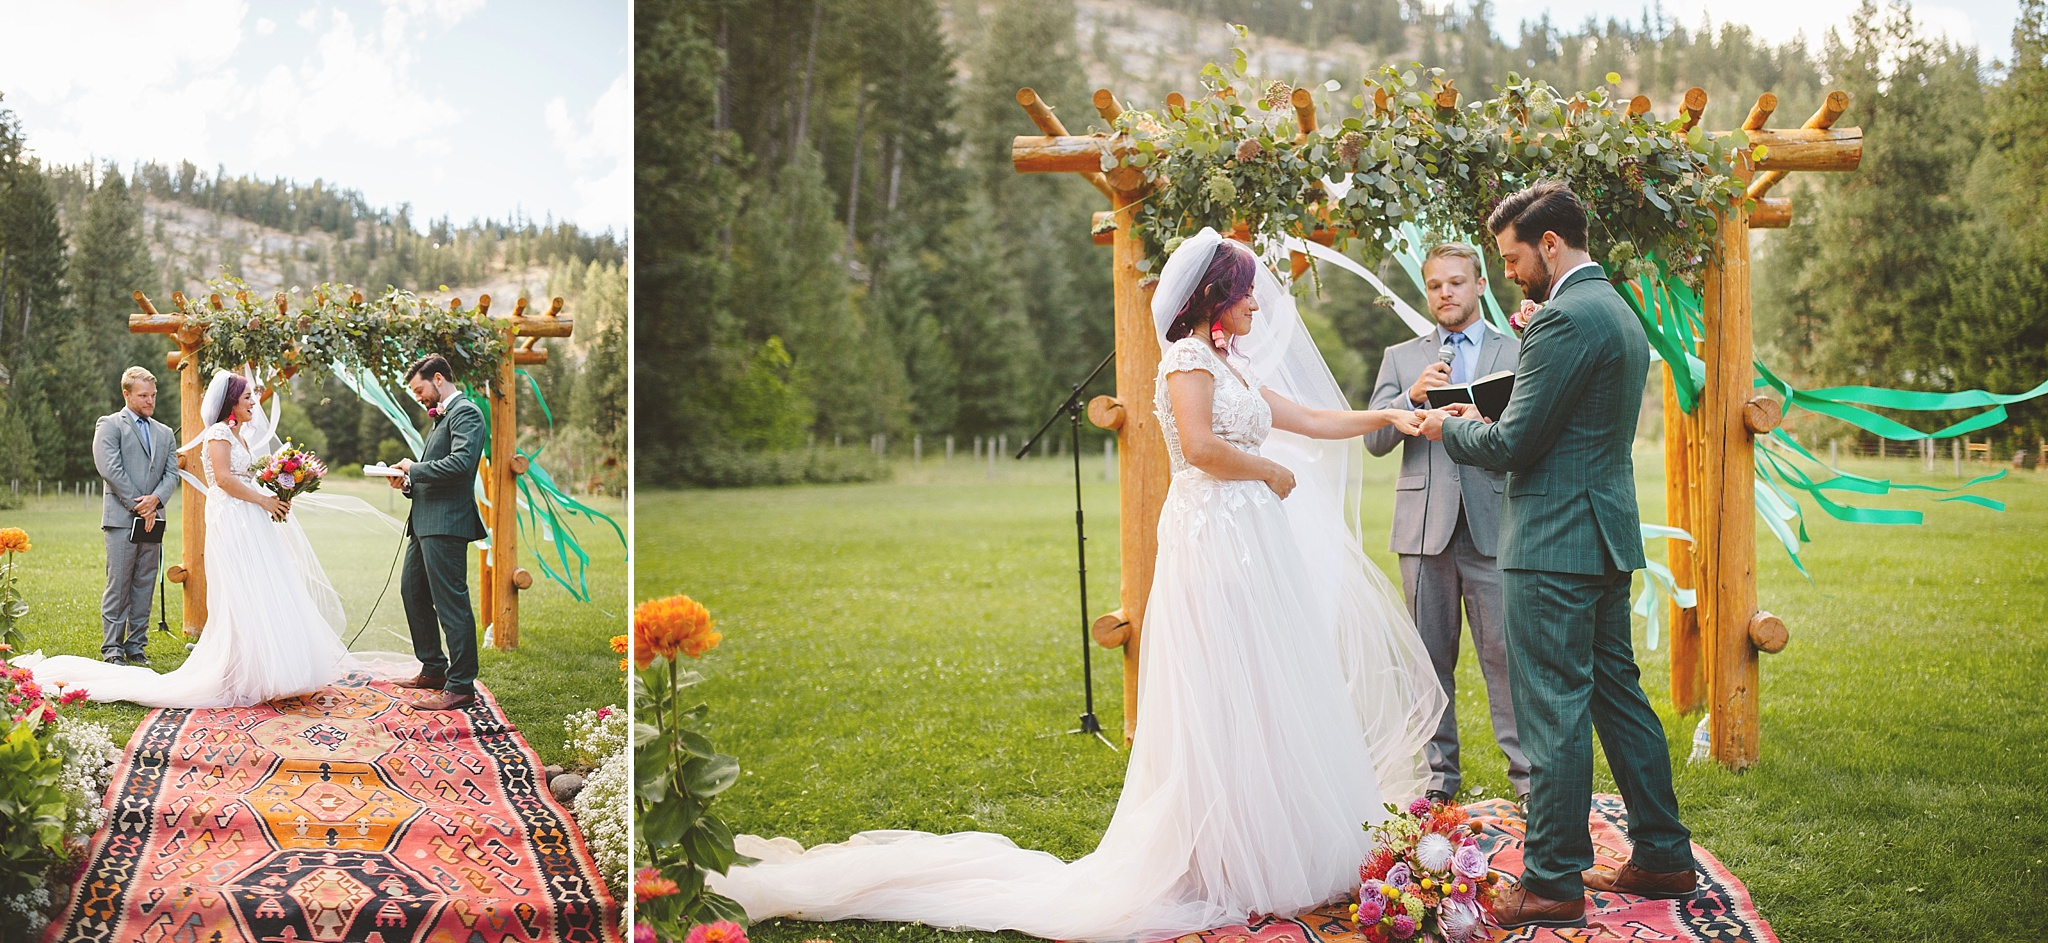 colorful bohemian wedding decoration